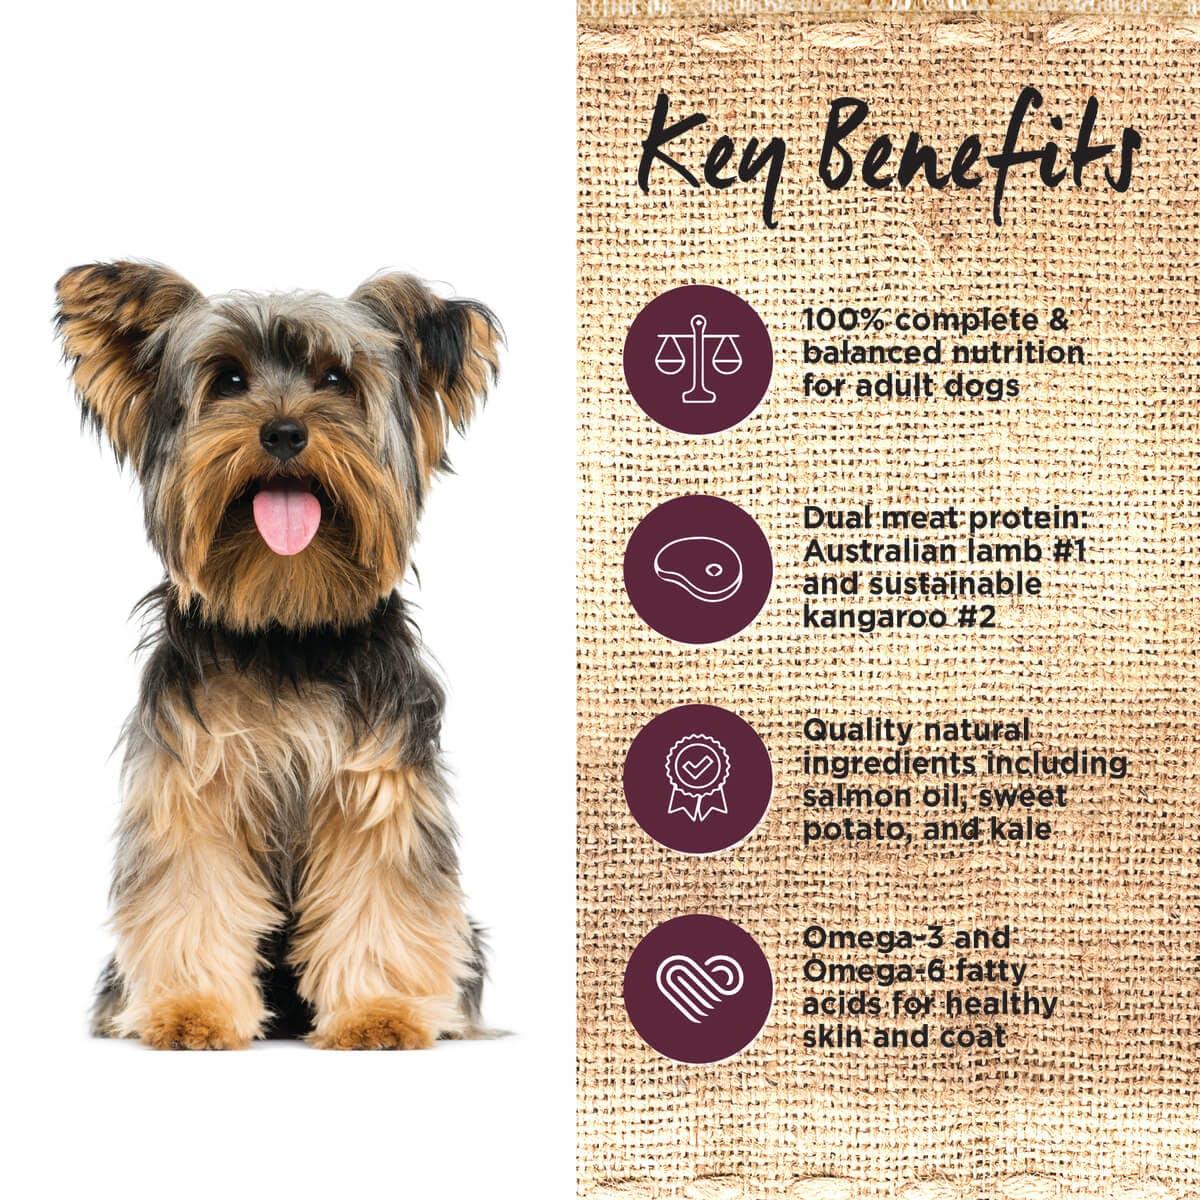 Ivory Coat | Dry GF Lamb & Kangaroo 2kg | Grain Free Dry Dog Food | Left of pack